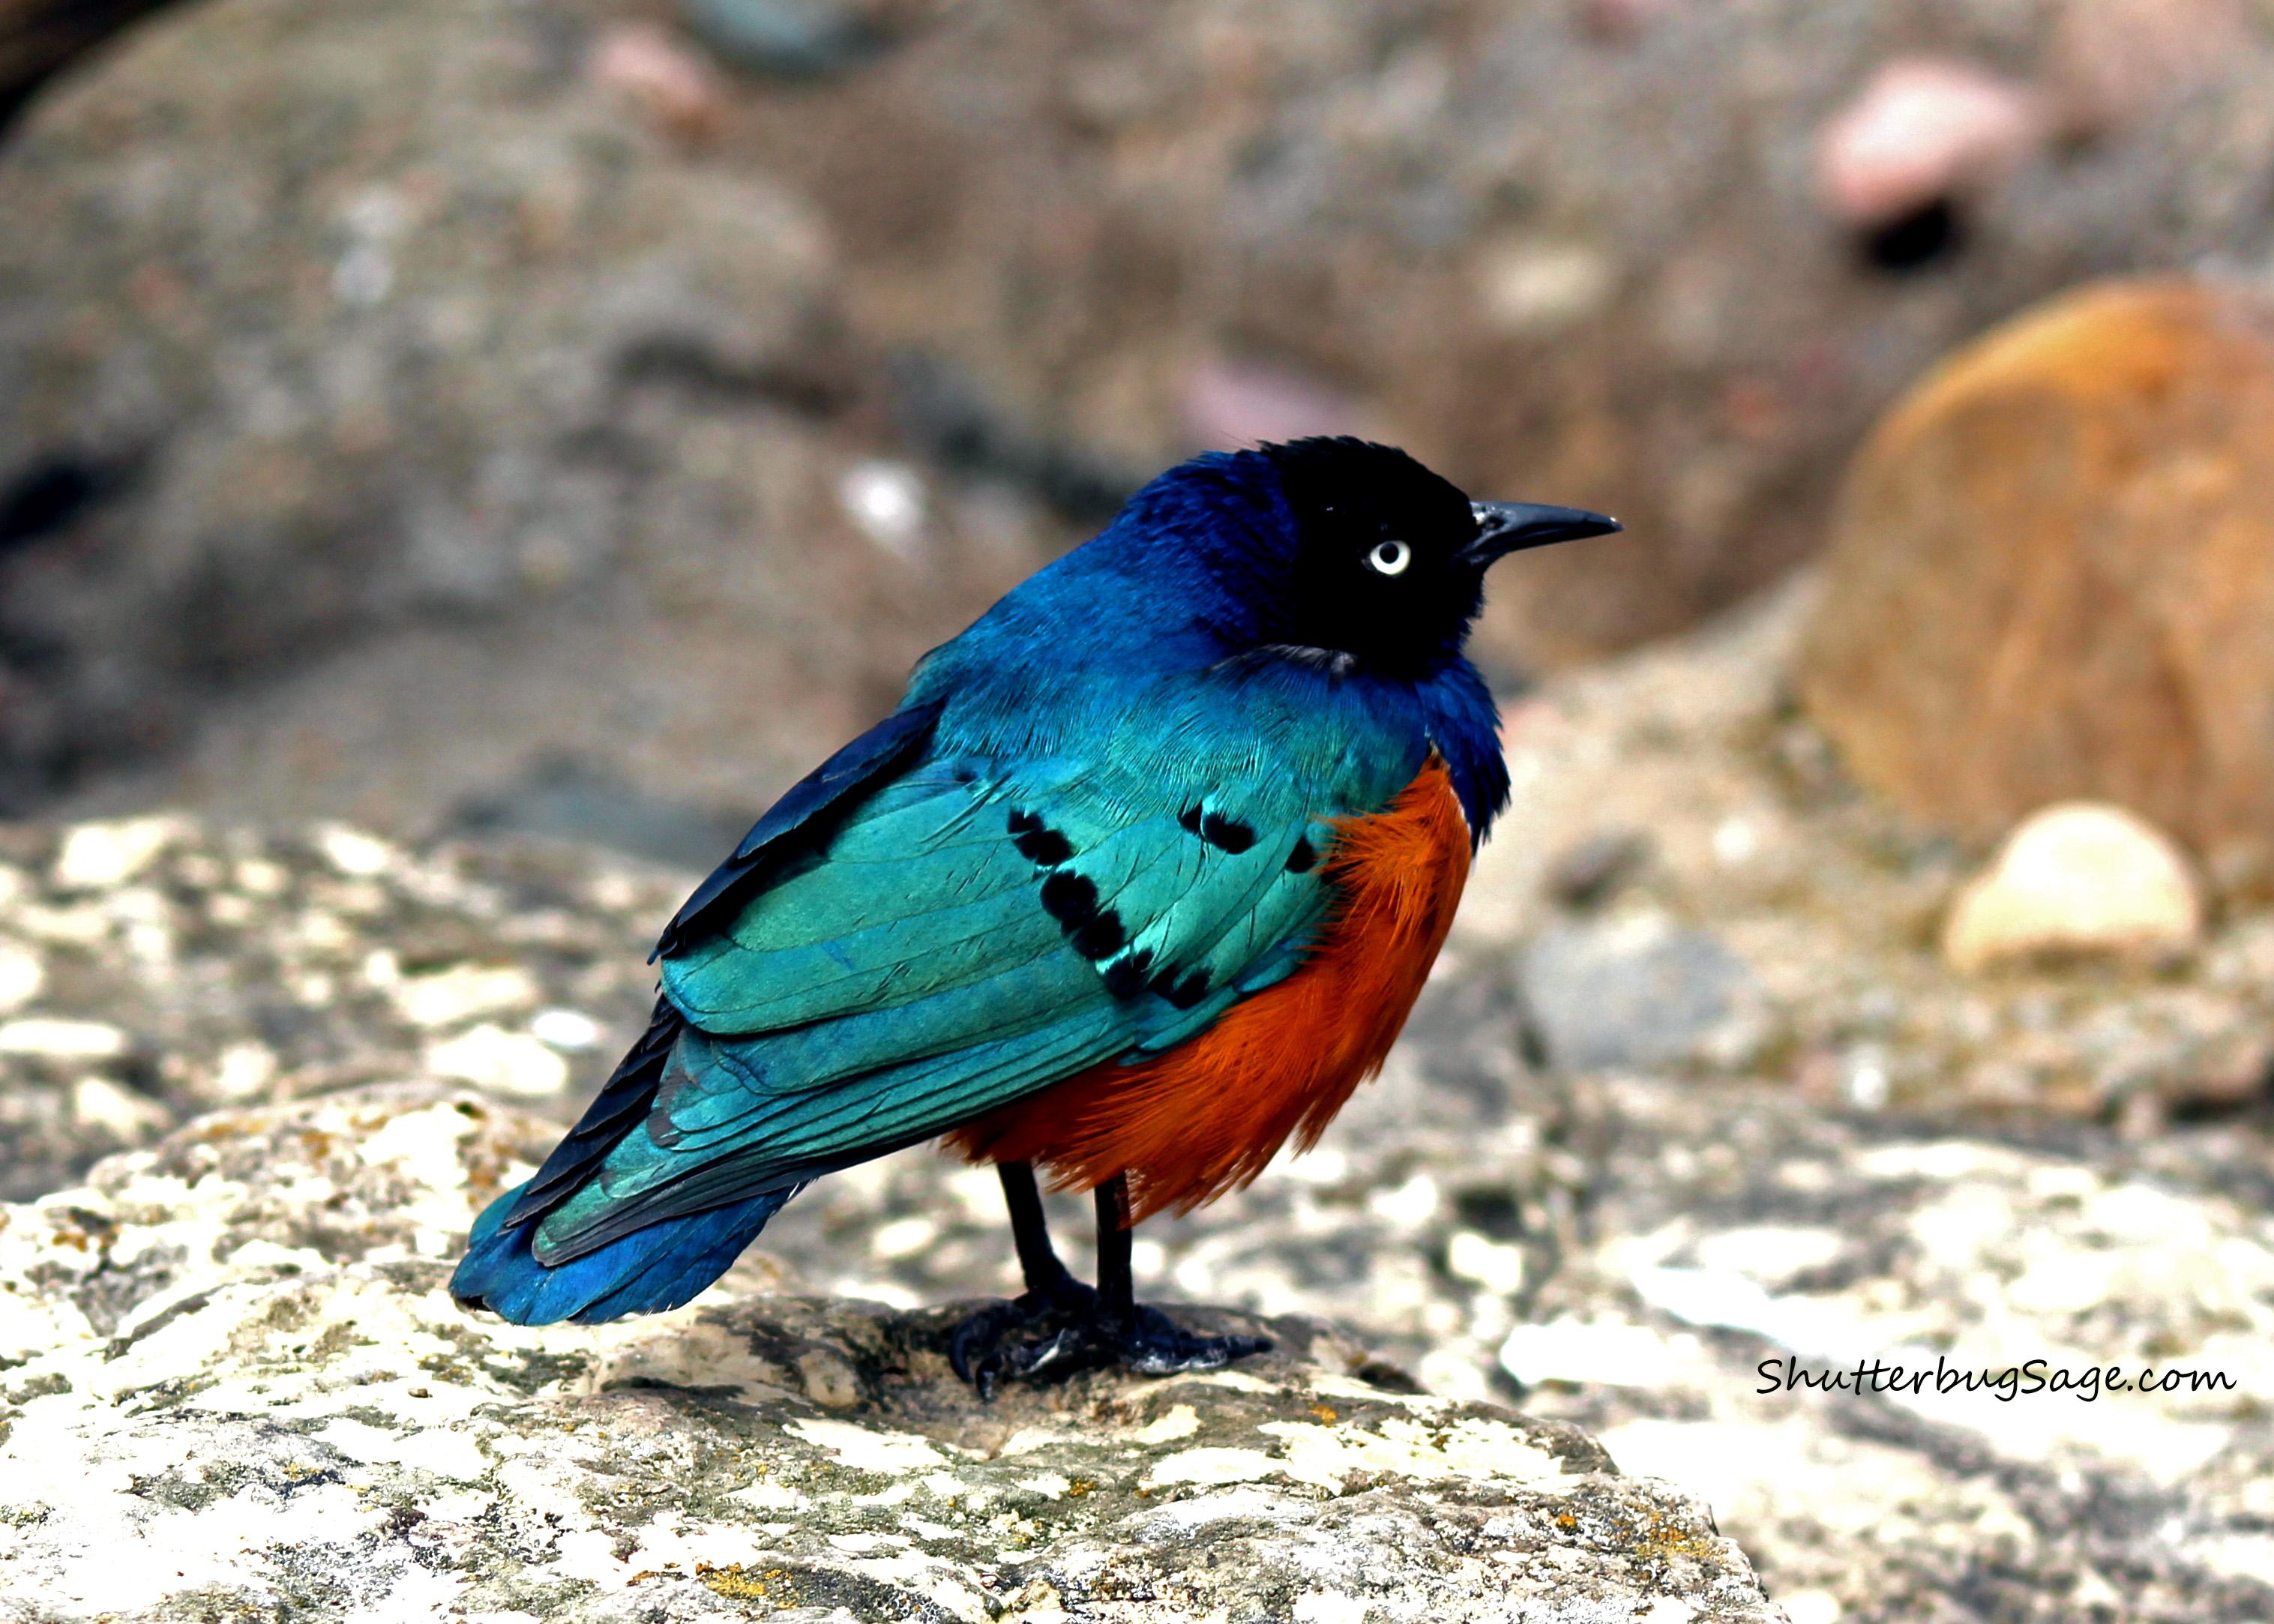 kansas city zoo birds shutterbugsage com